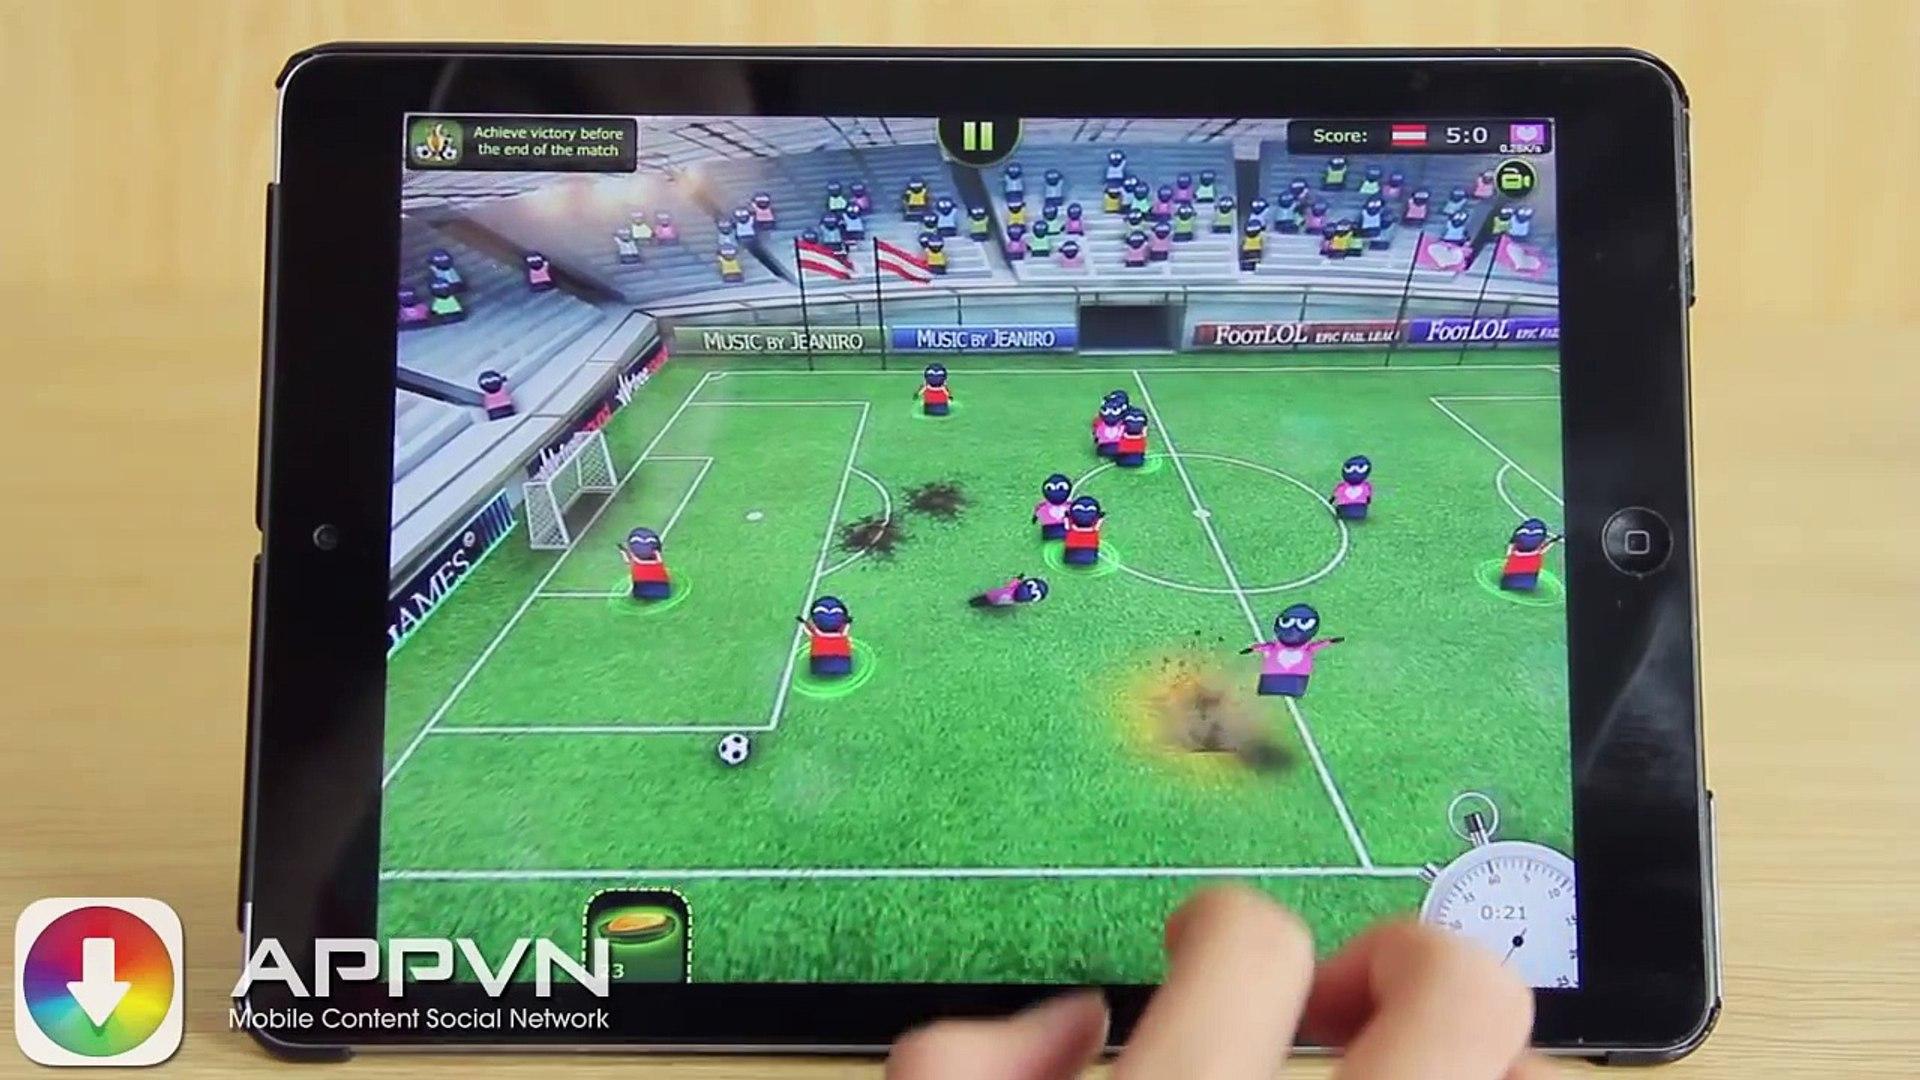 [Game] FootLOL - Bóng đá chiến tranh - AppStoreVn